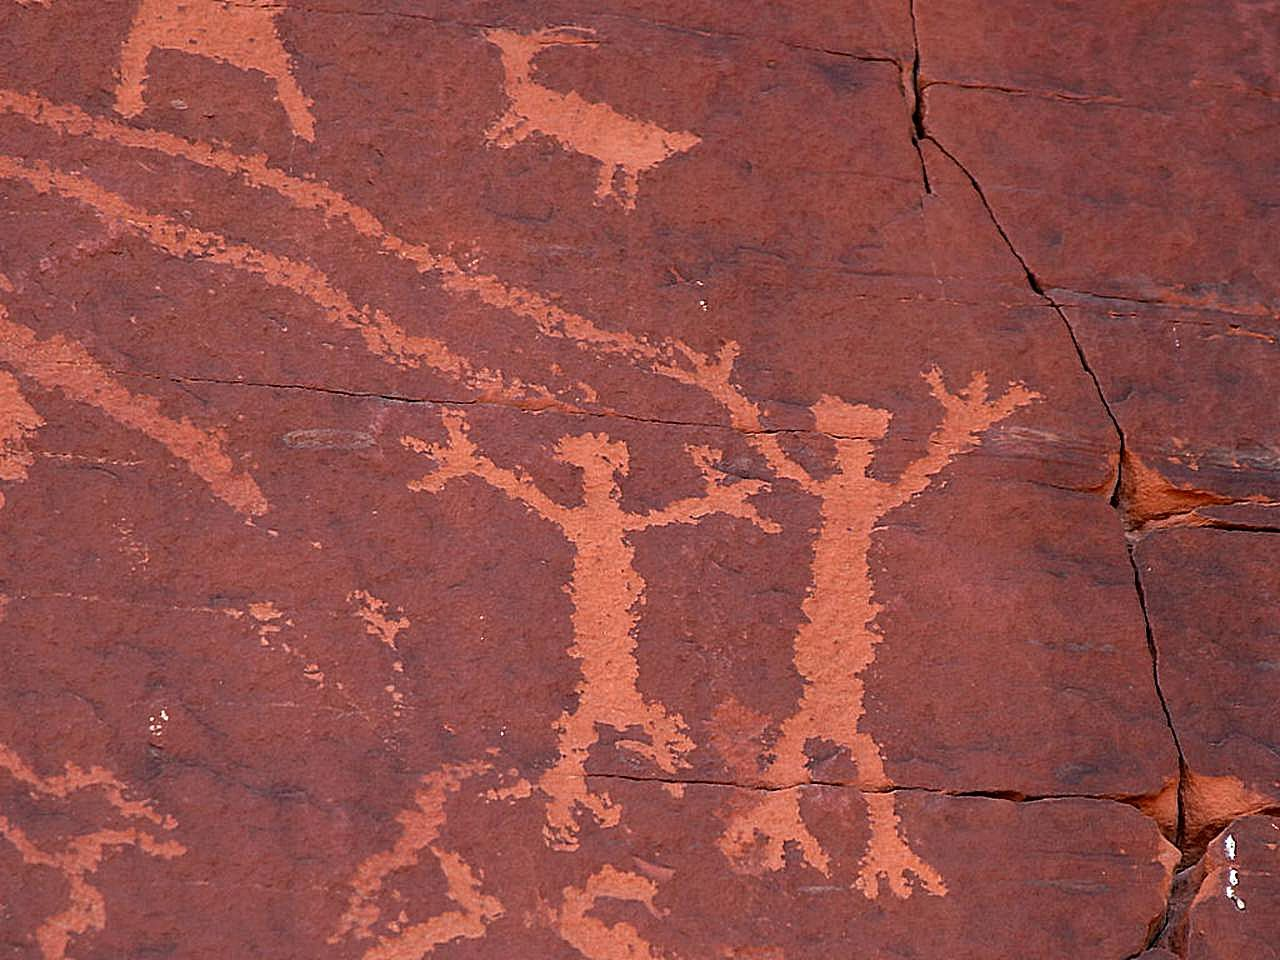 Courtesy : http://www.copyright-free-images.com